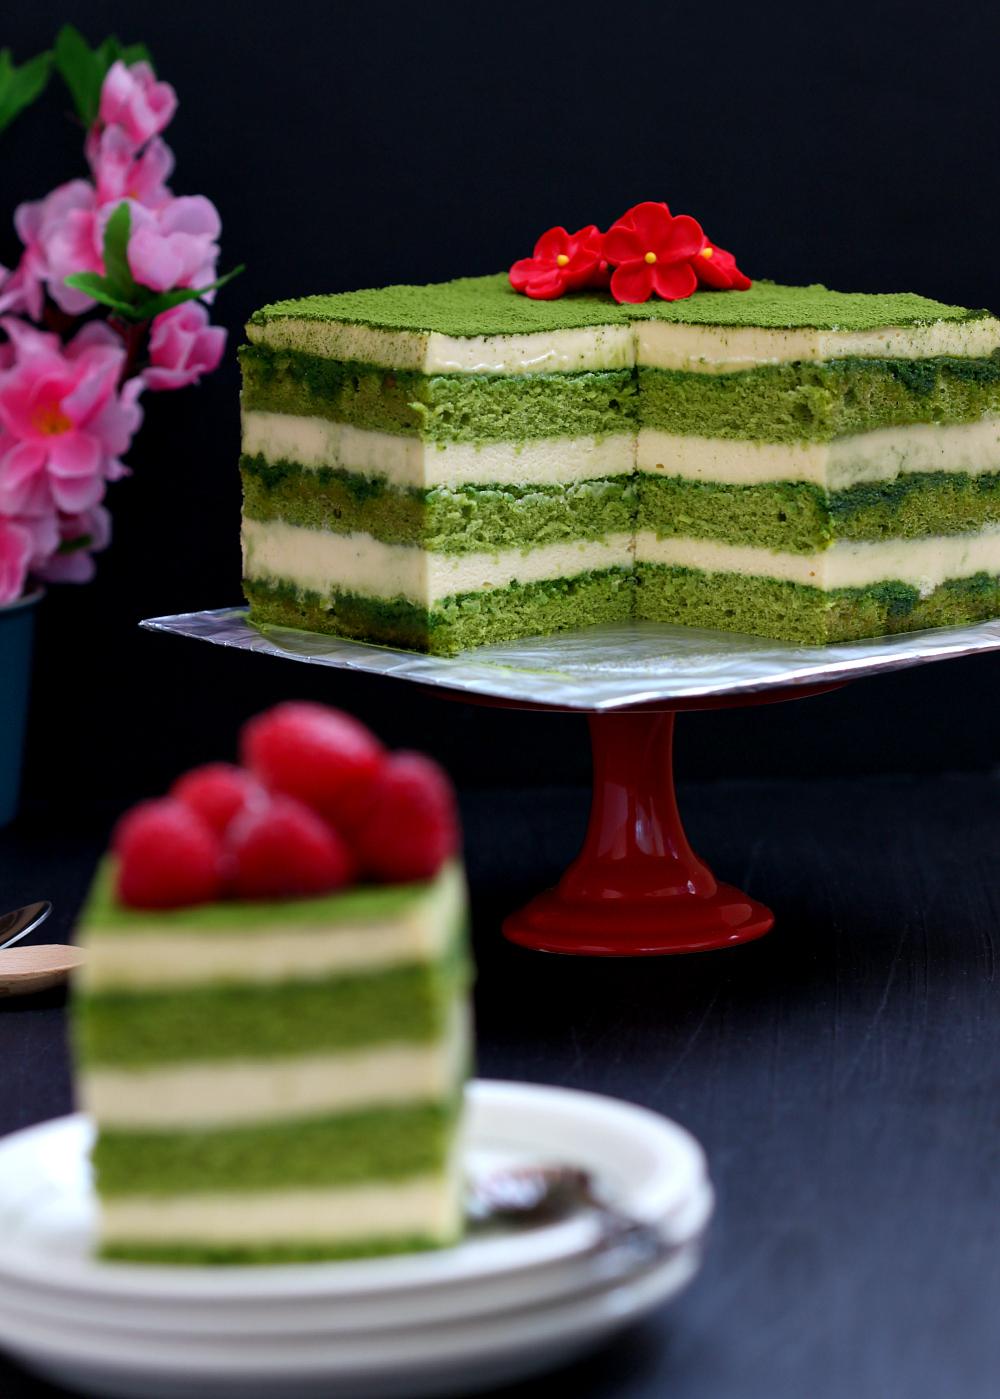 Best Matcha Cake Recipes